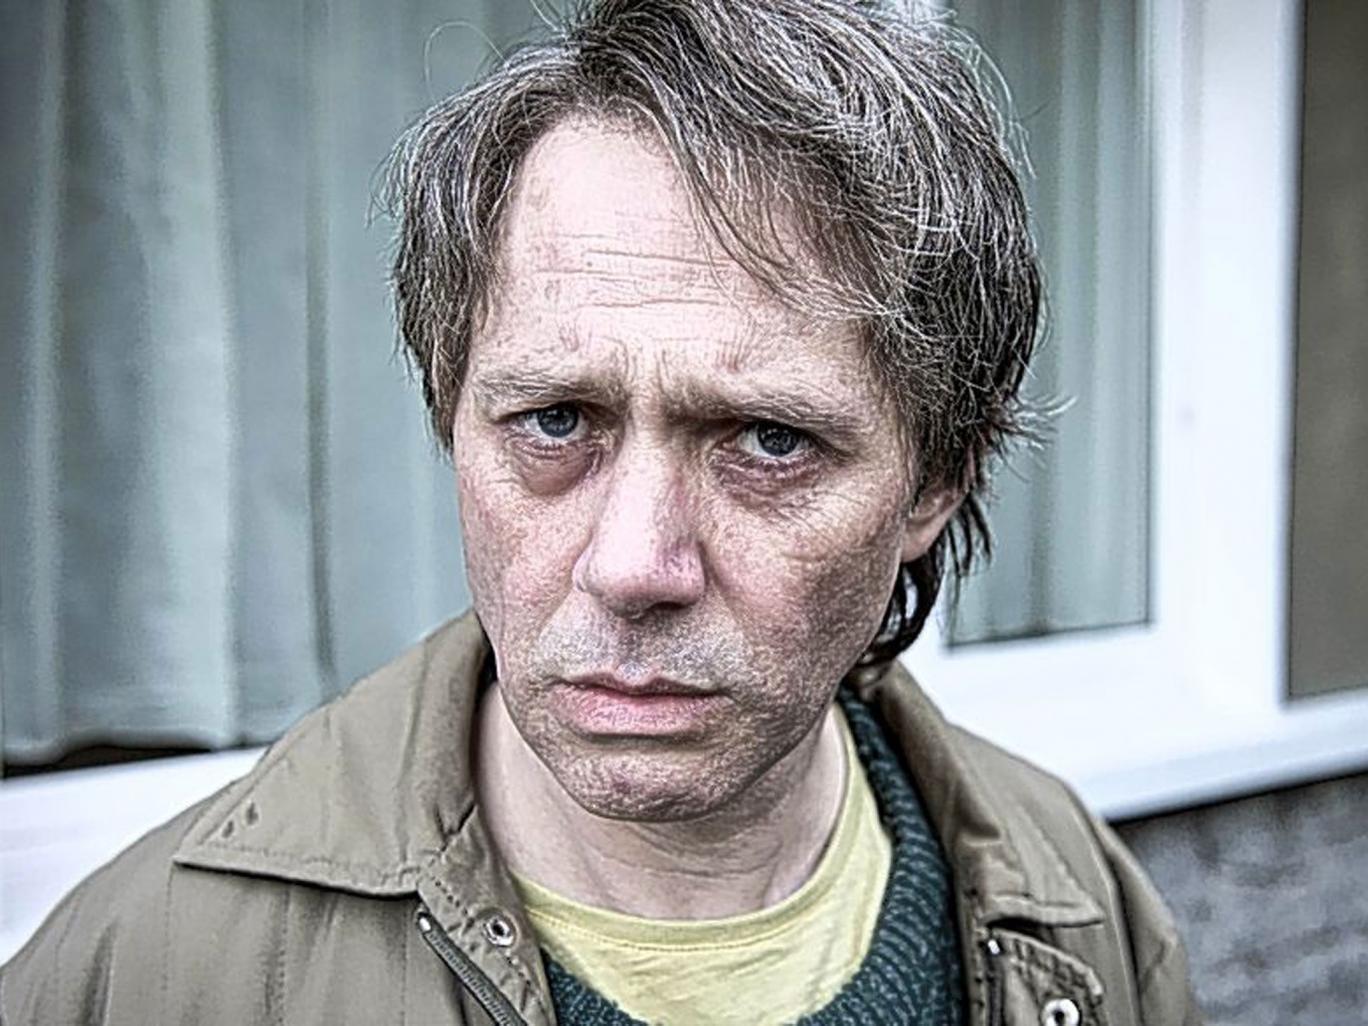 Murder in mind: Reece Shearsmith as Malcolm Webster in 'The Widower'